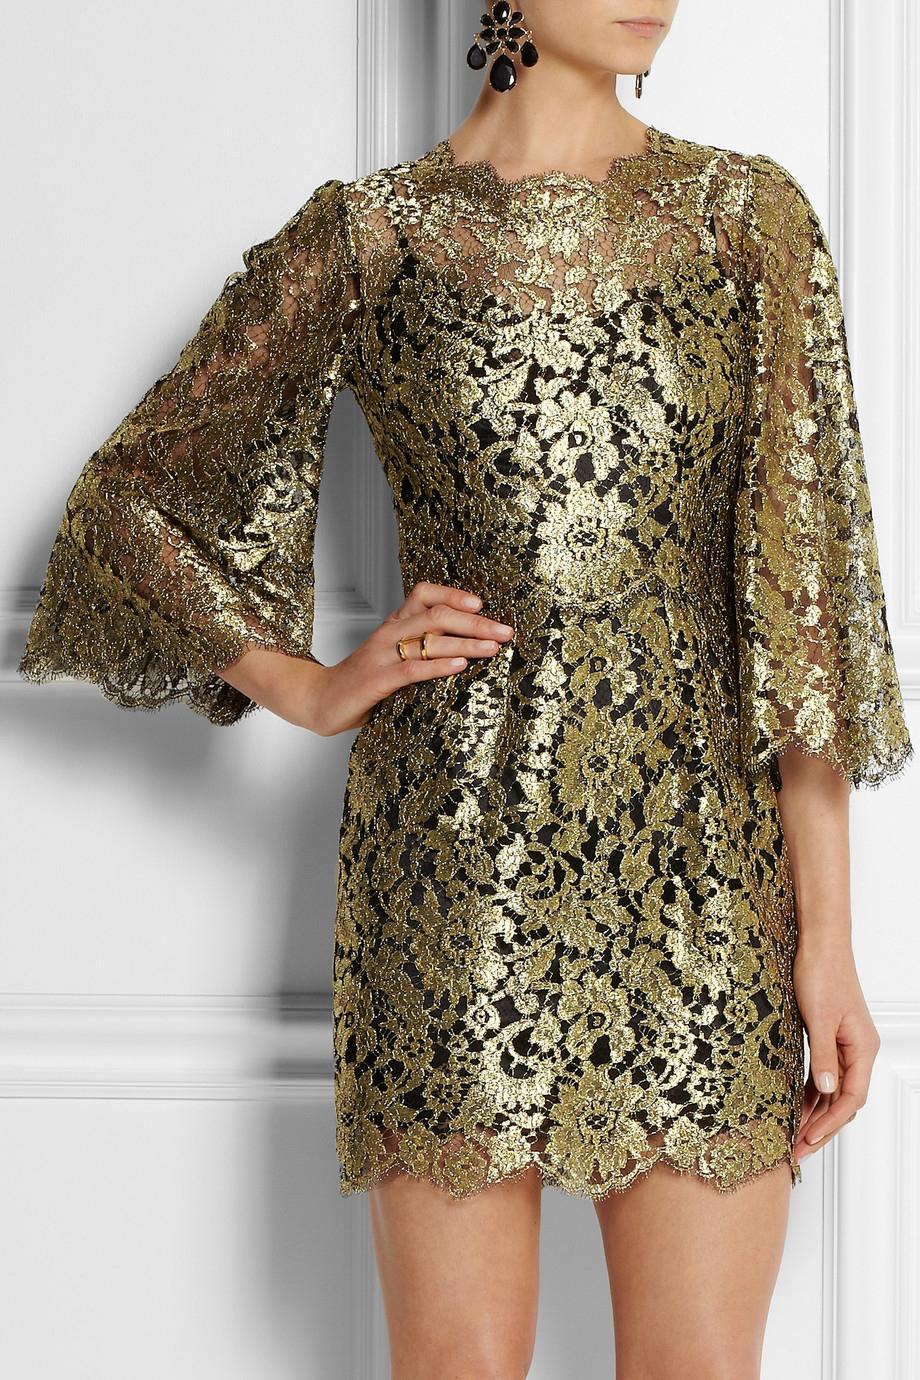 a5cad69b9a1b Dolce & Gabbana Swarovski Crystalembellished Metallic Lace Mini ...